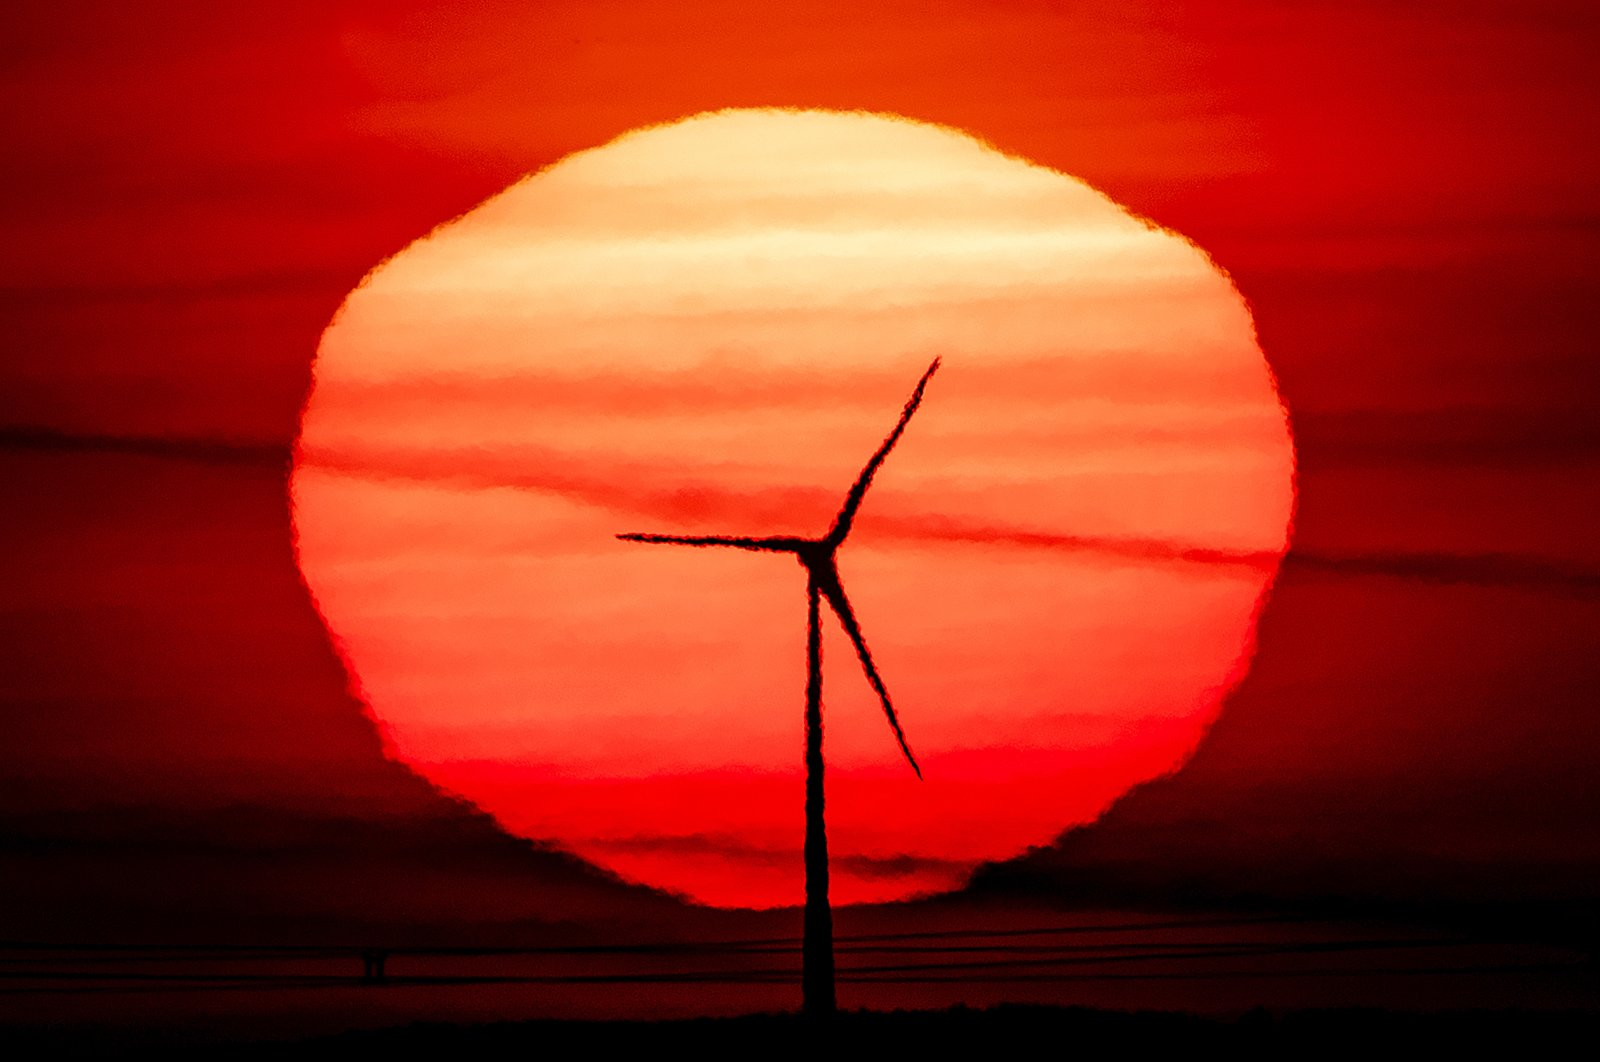 The sun rises behind a wind turbine in Frankfurt, Germany, Sept. 15, 2020. (AP Photo)